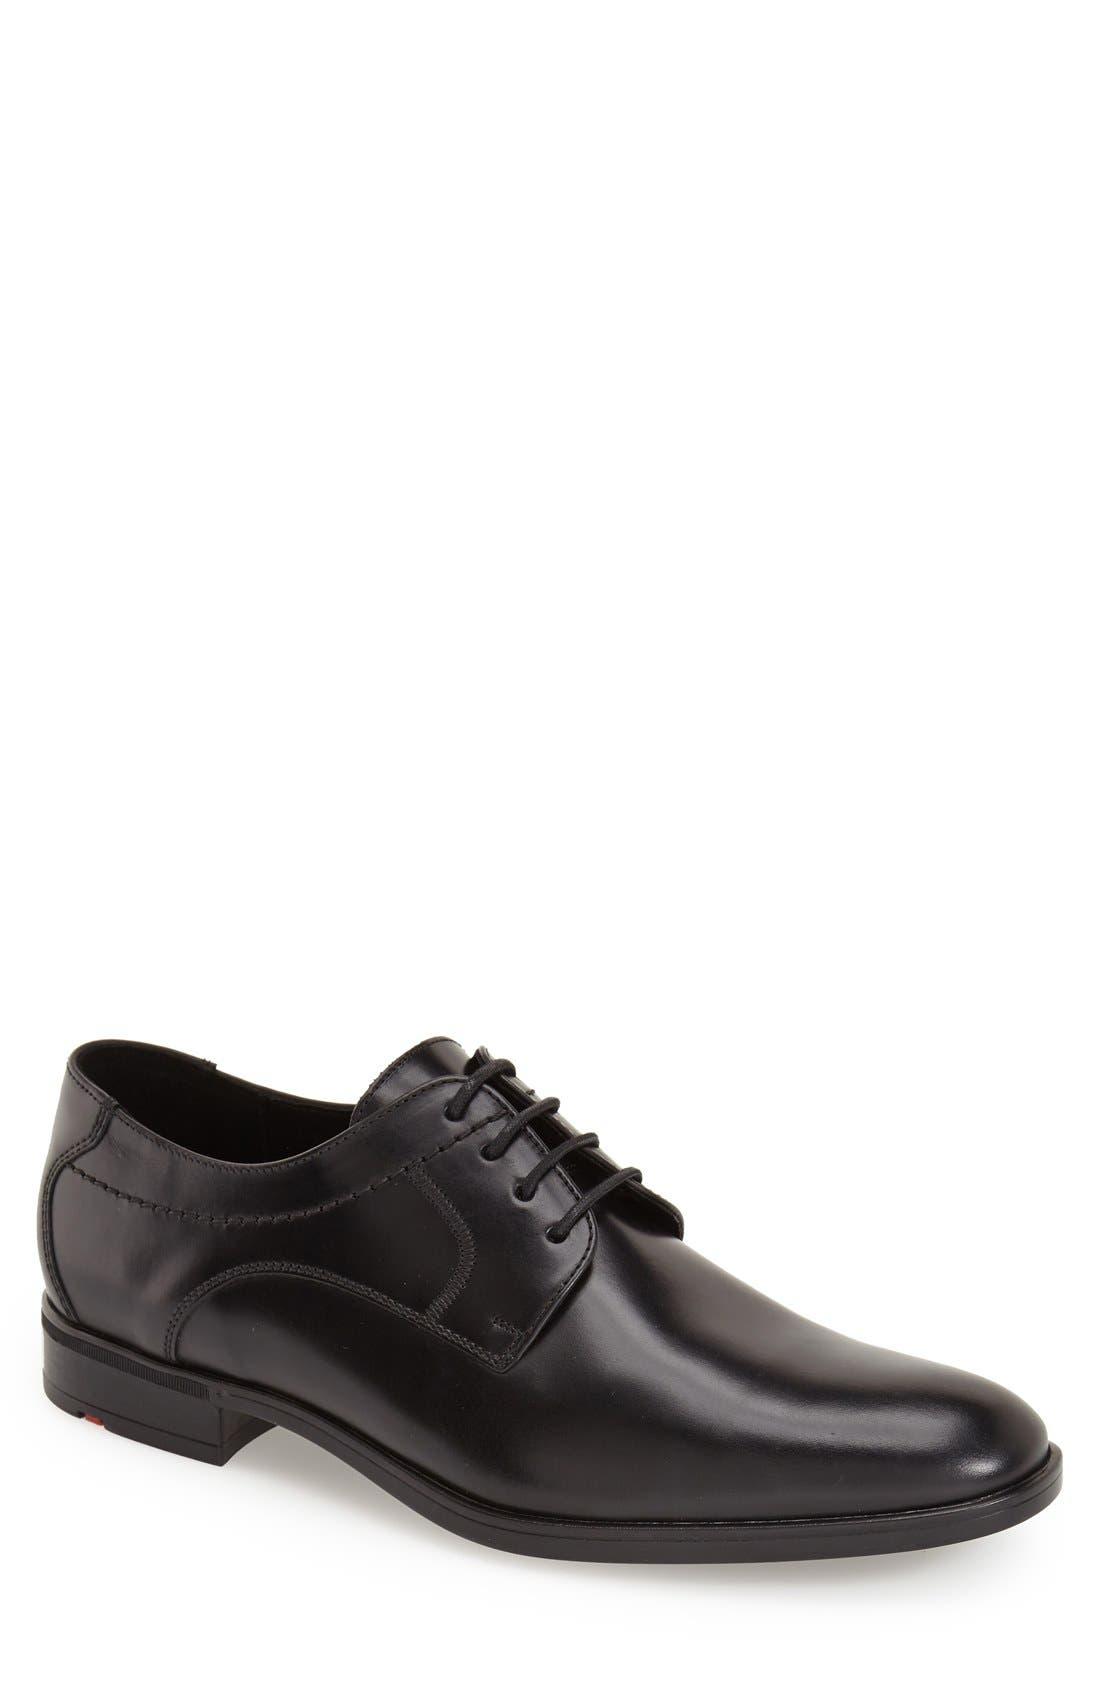 'Gildo' Plain Toe Derby,                             Main thumbnail 1, color,                             Black